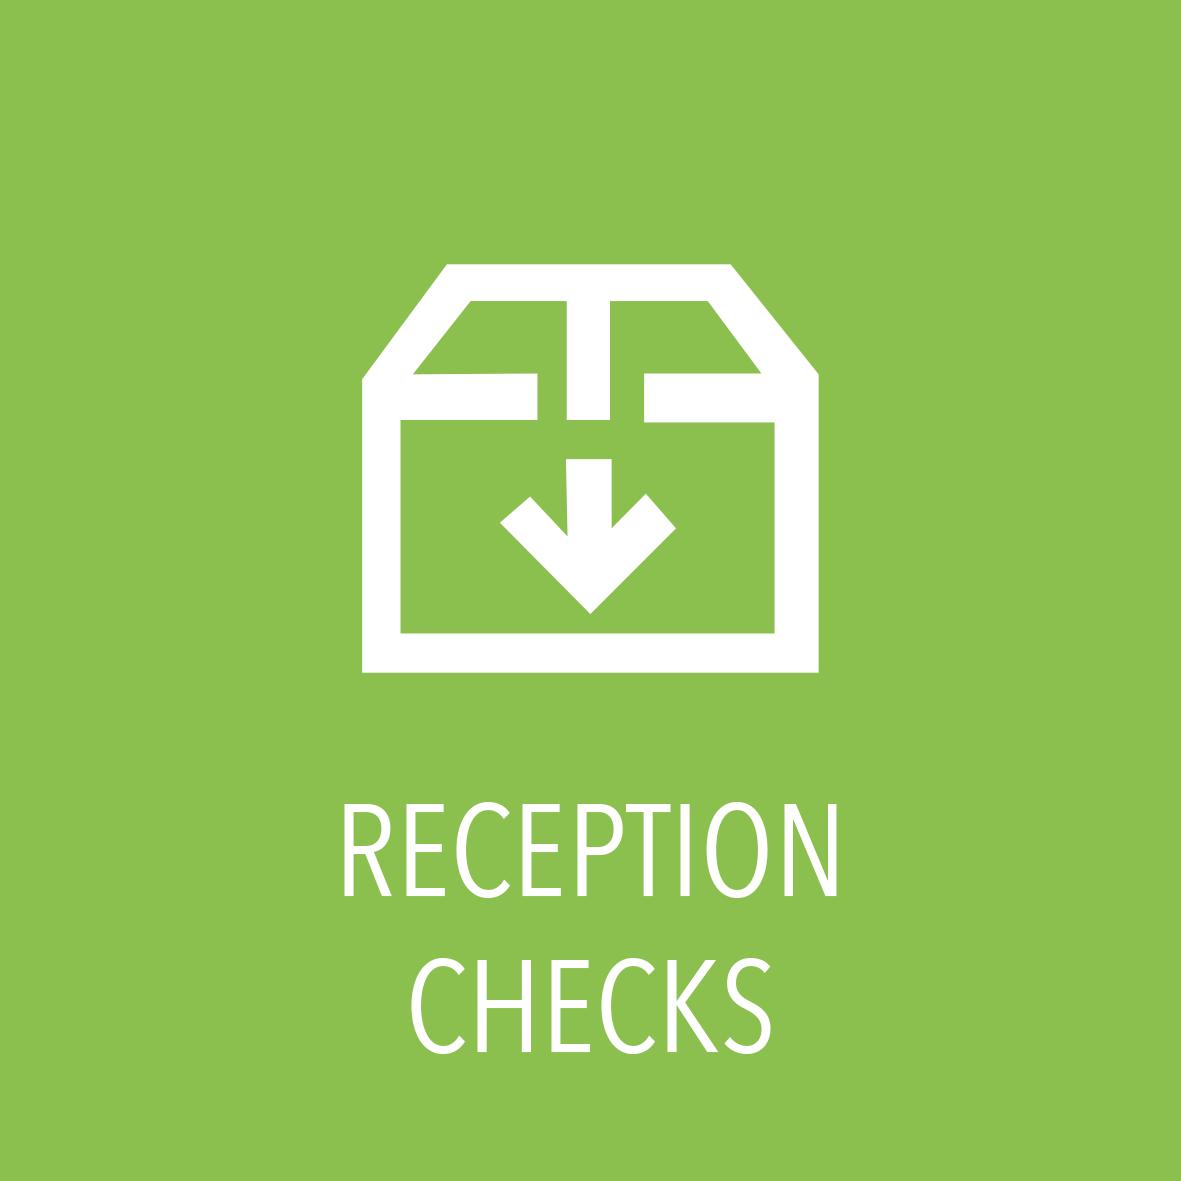 RECEPTION CHECKS.png